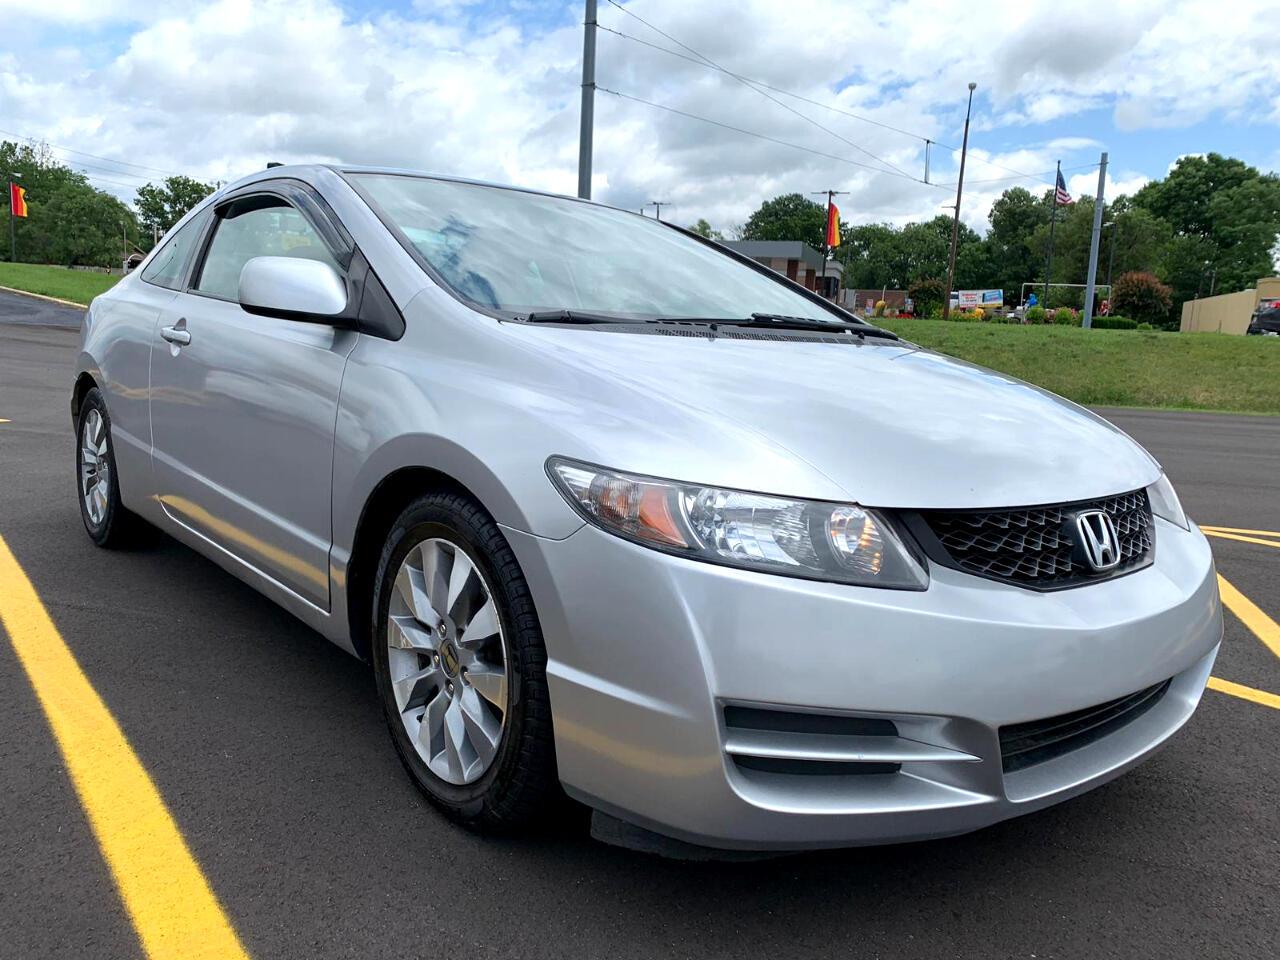 2010 Honda Civic EX-L Coupe 5-Speed AT